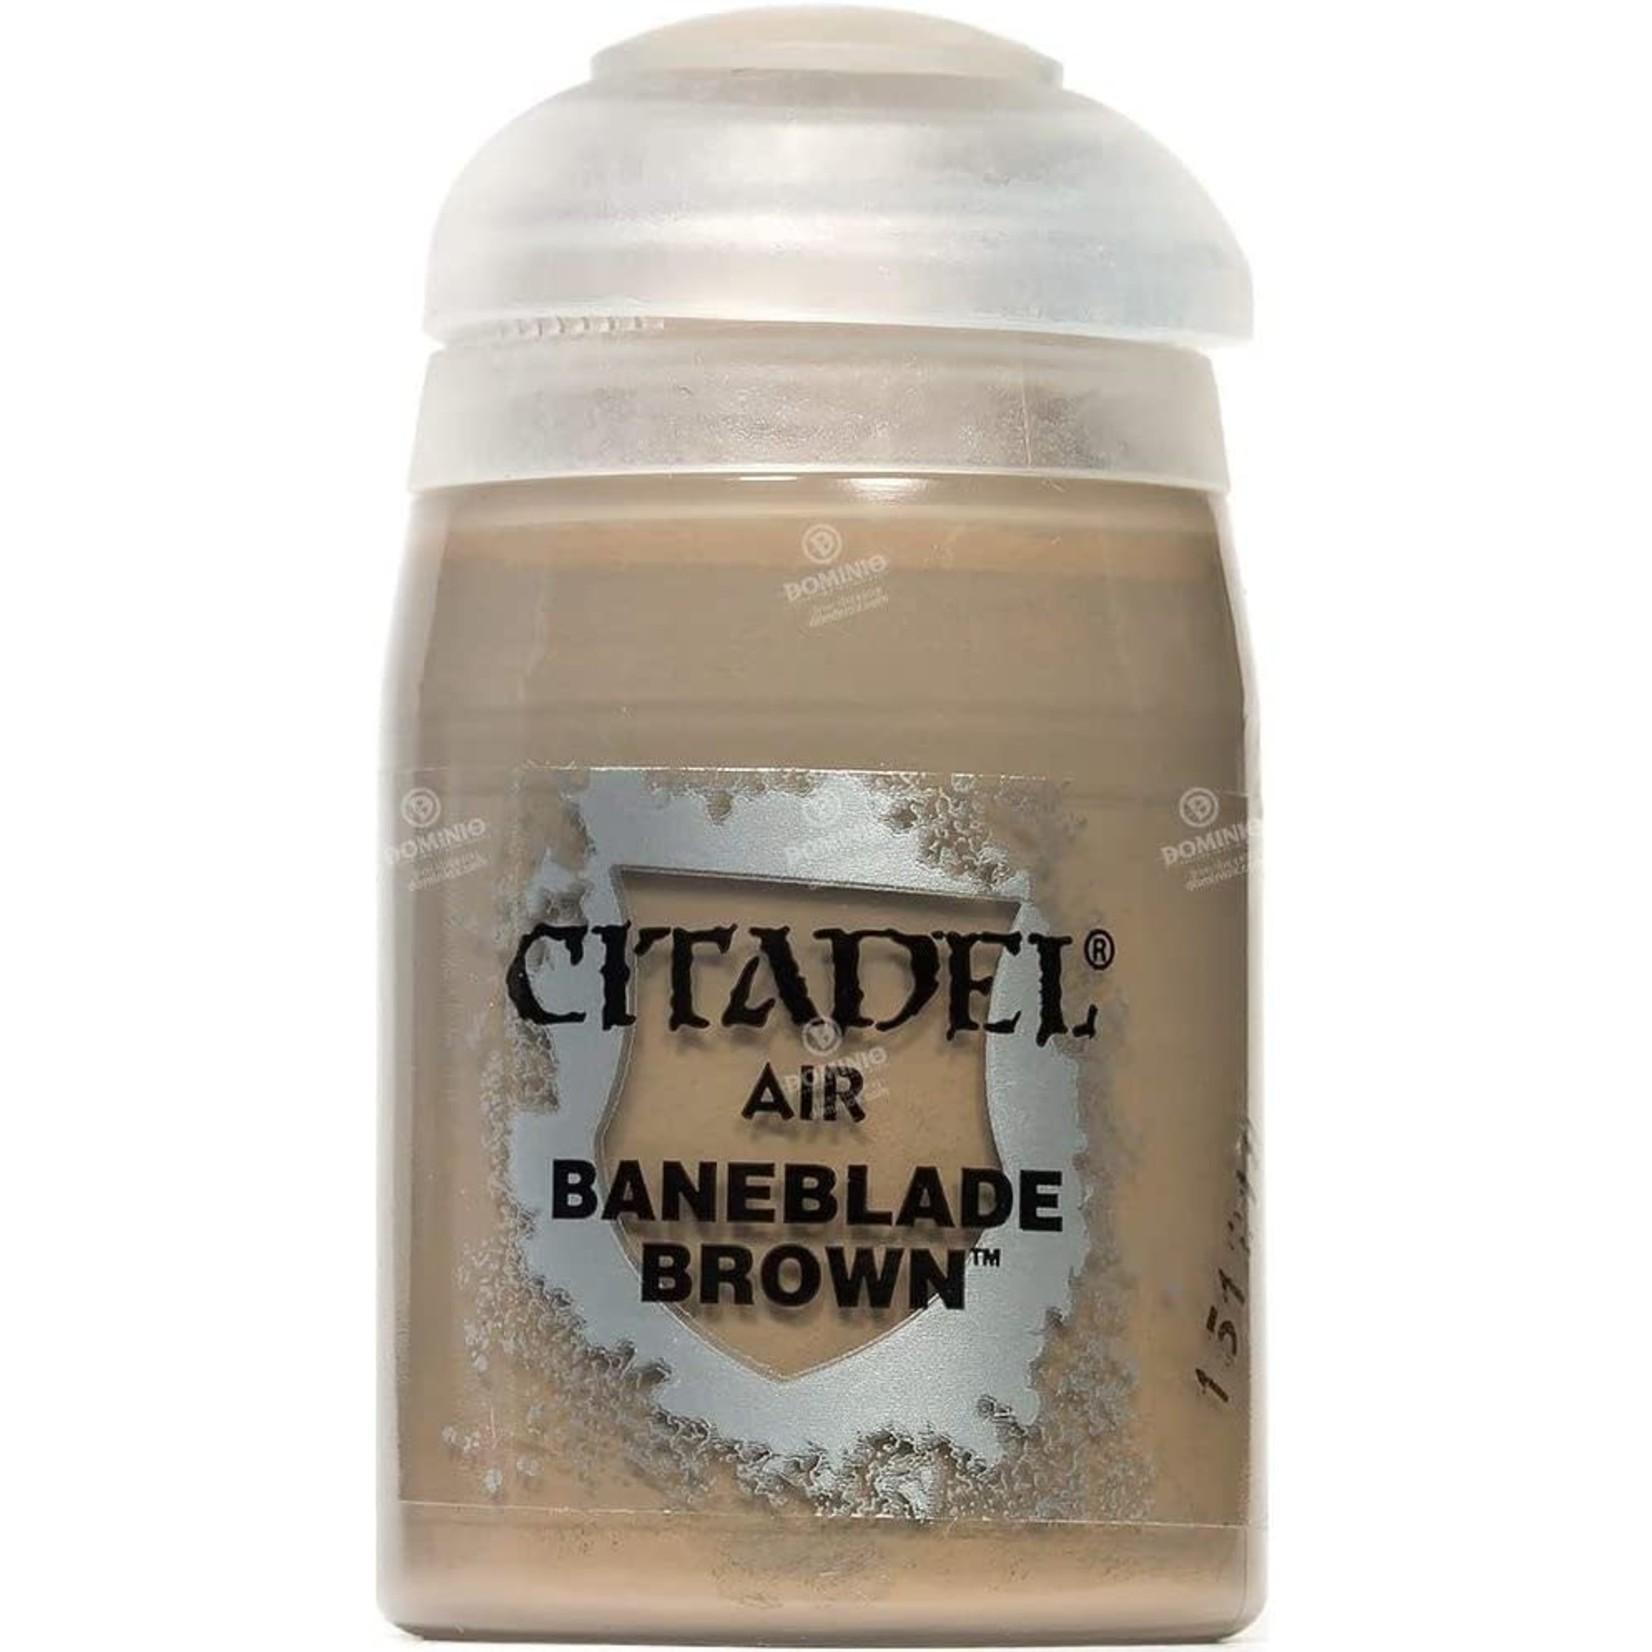 Games Workshop Citadel Paint: Baneblade Brown Air (24 ml)